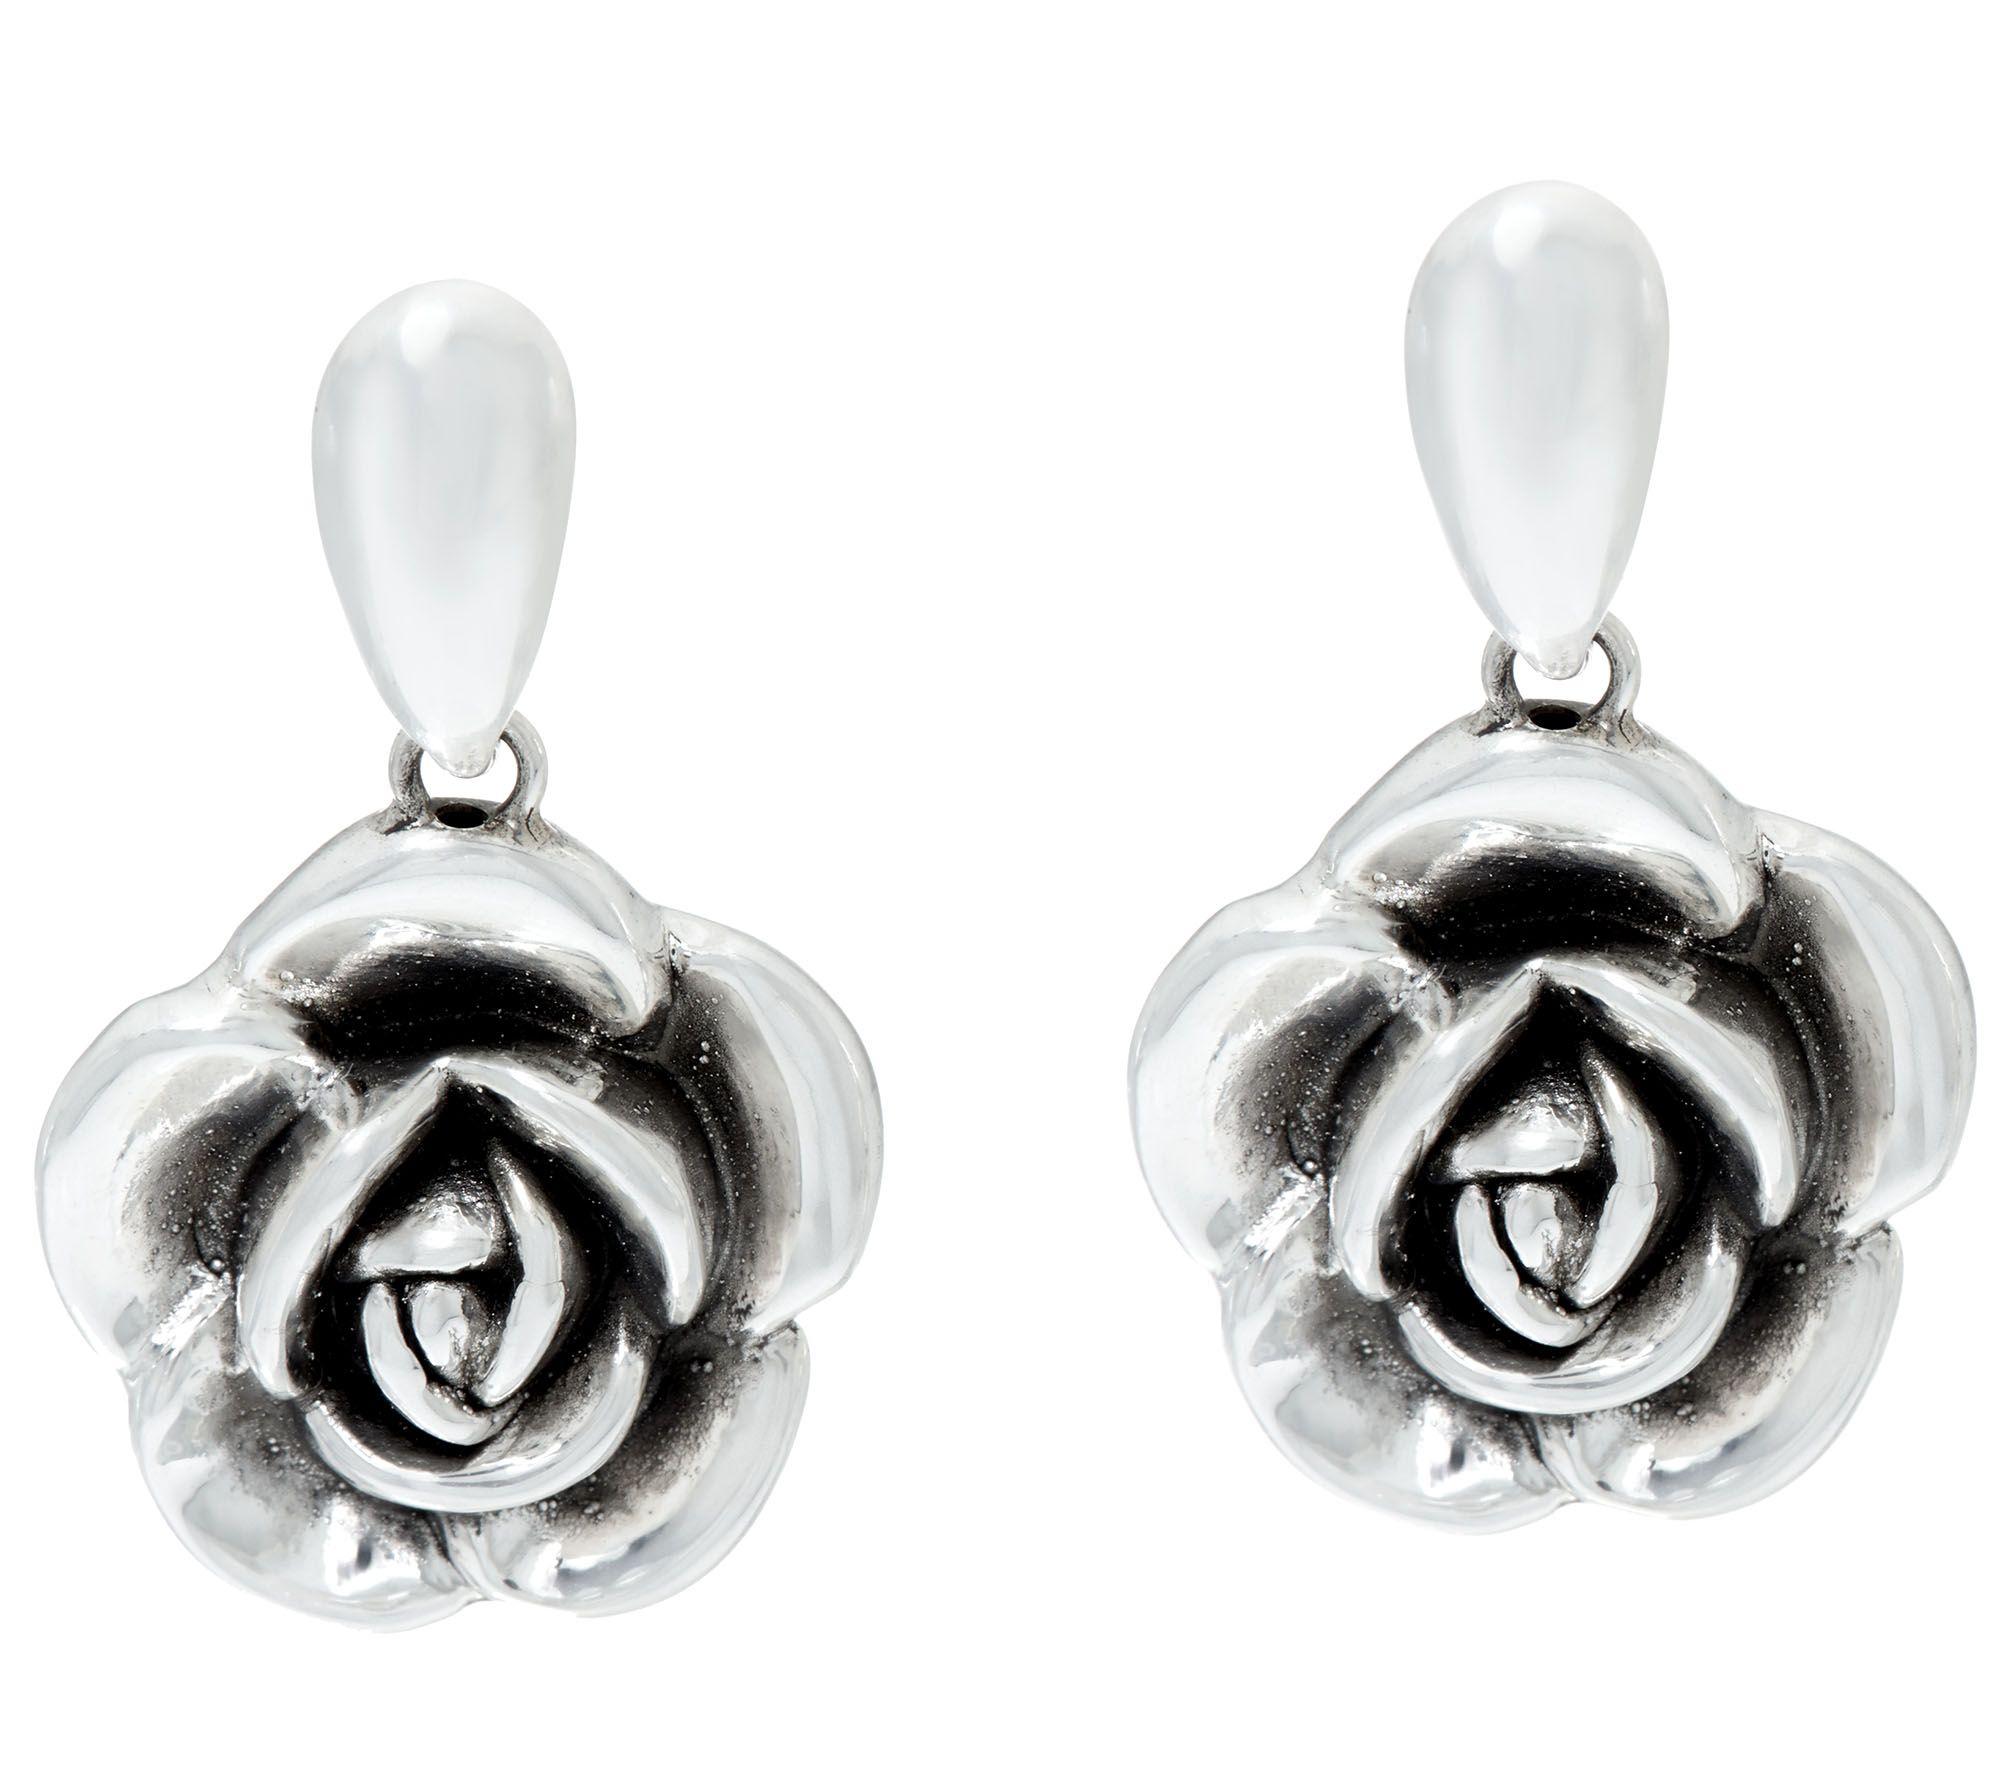 Israeli Jewelry Designer Qvc Thin Blog